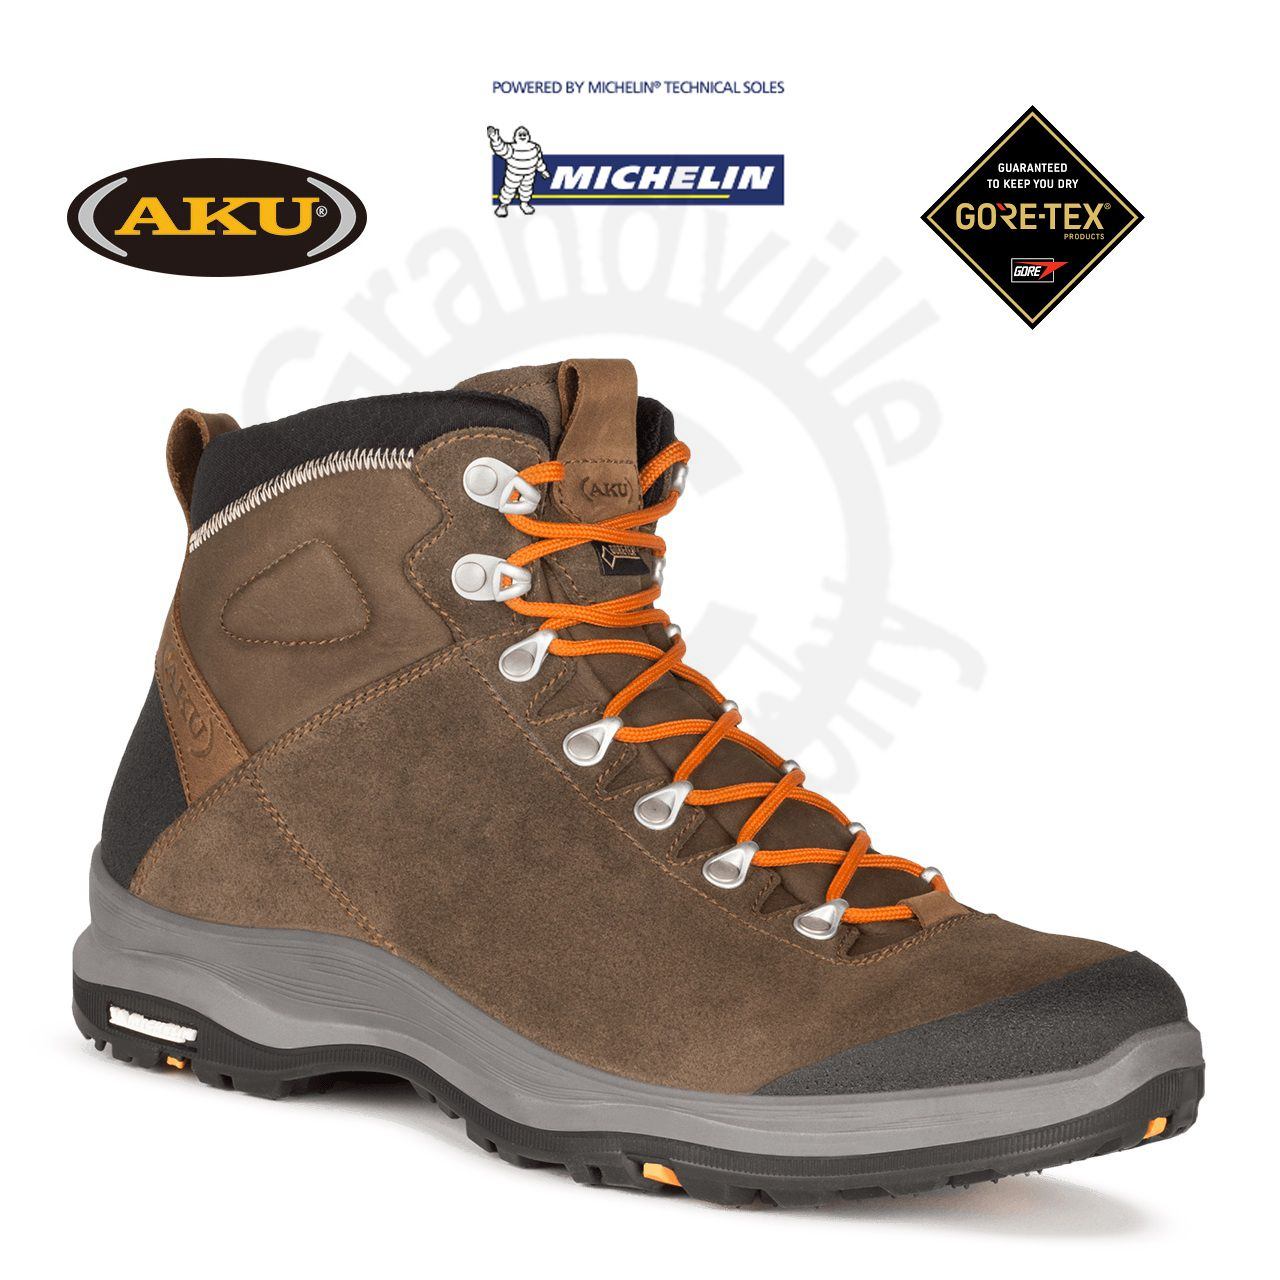 f73960b6f24 Aku  AKU La Val GTX Brown Treková obuv 42   8